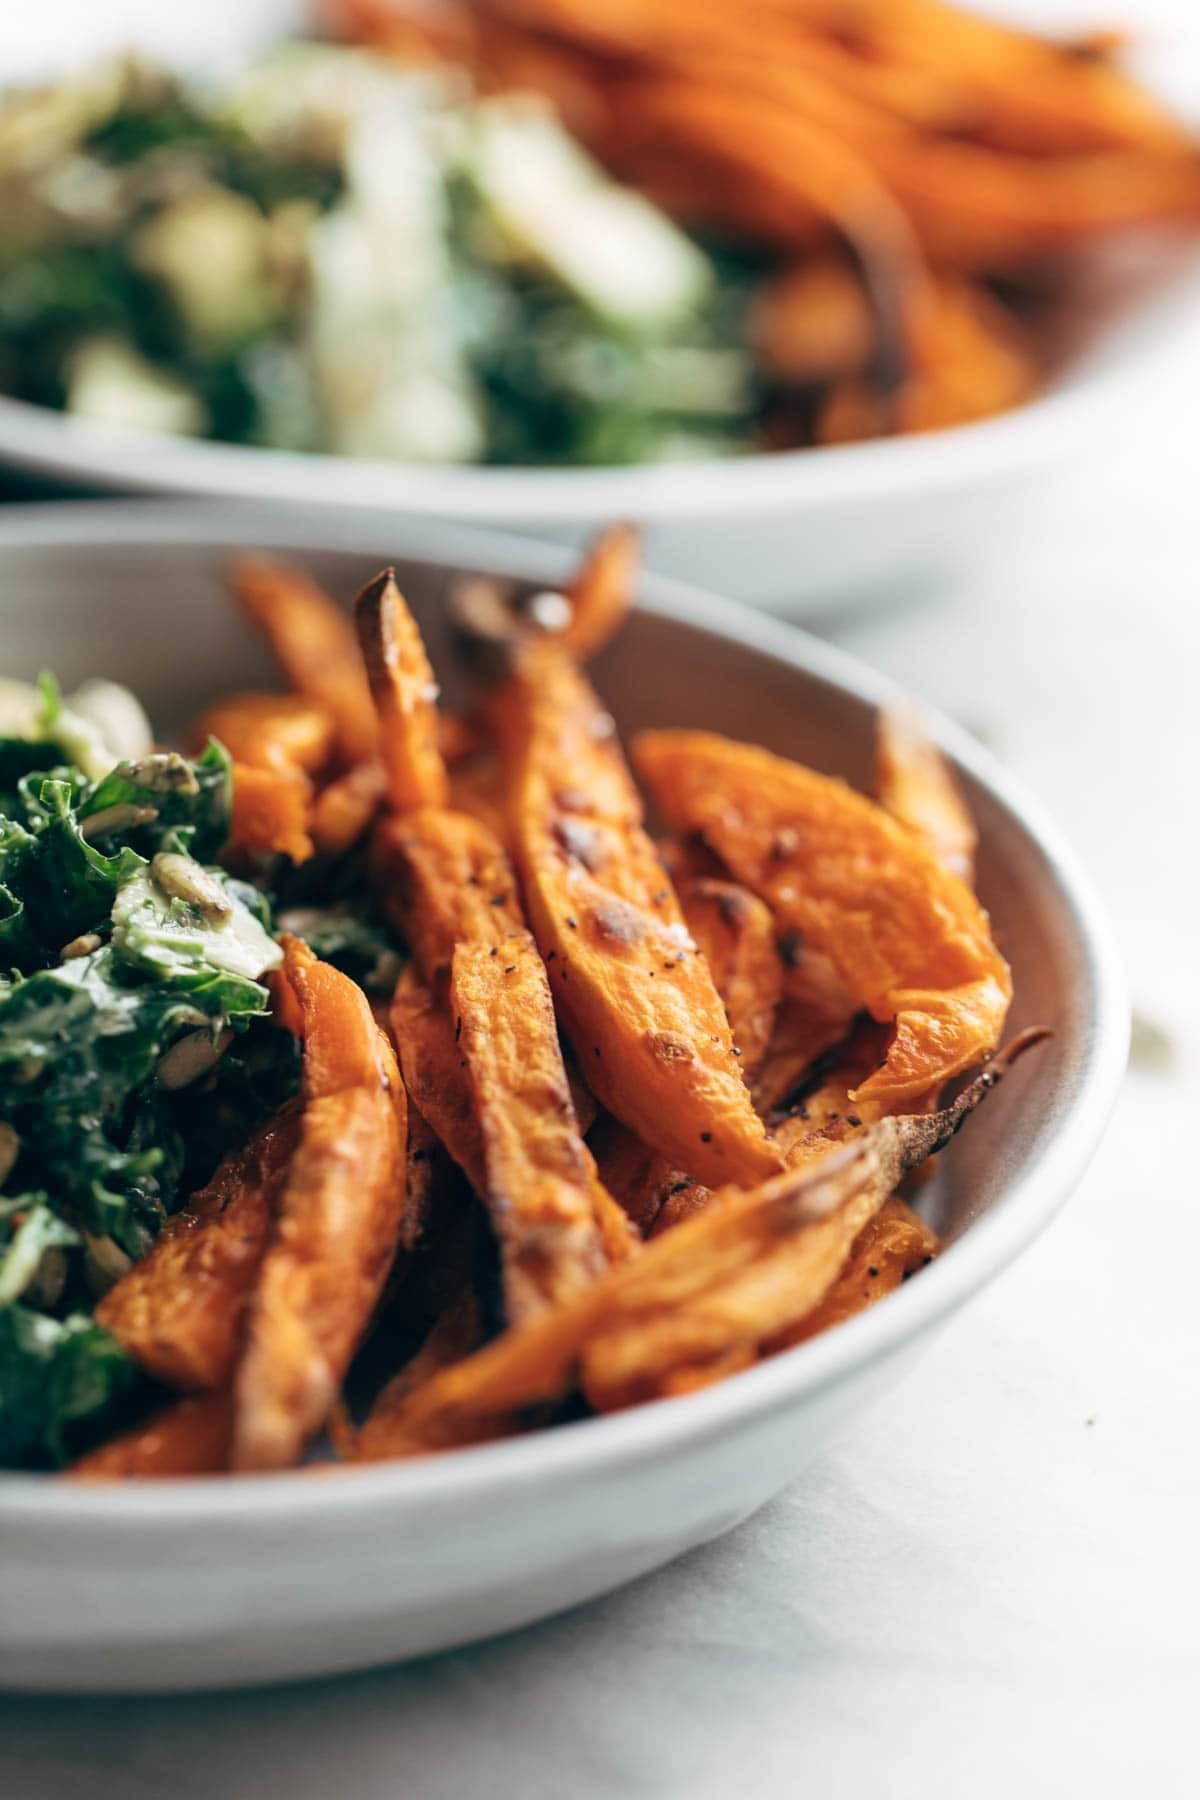 Sweet potato fries in bowl.